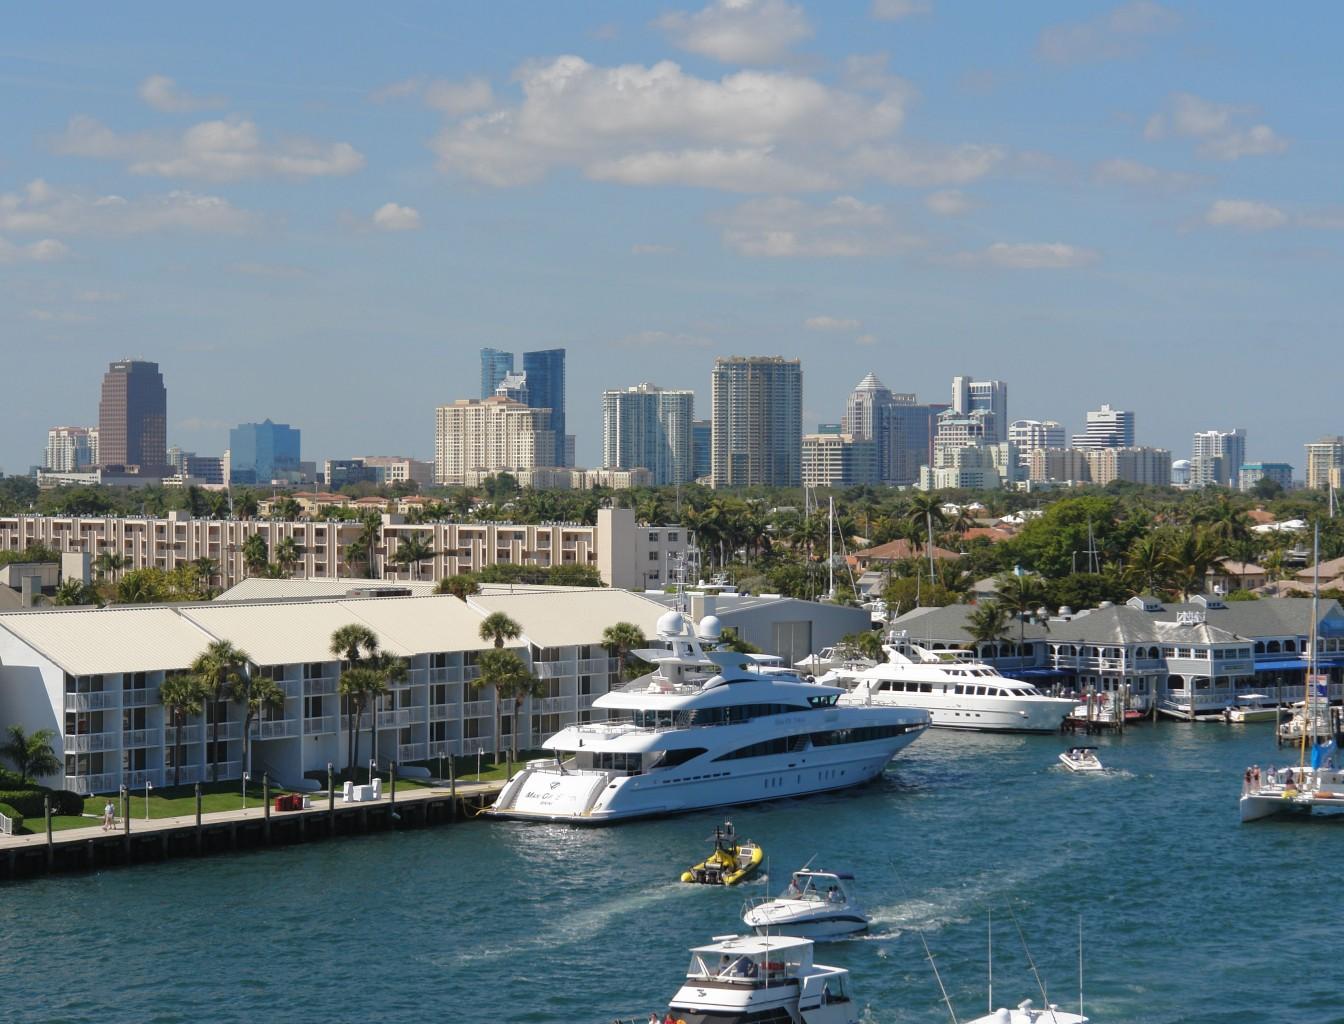 Fort Lauderdale Video Production Company - Bonomotion